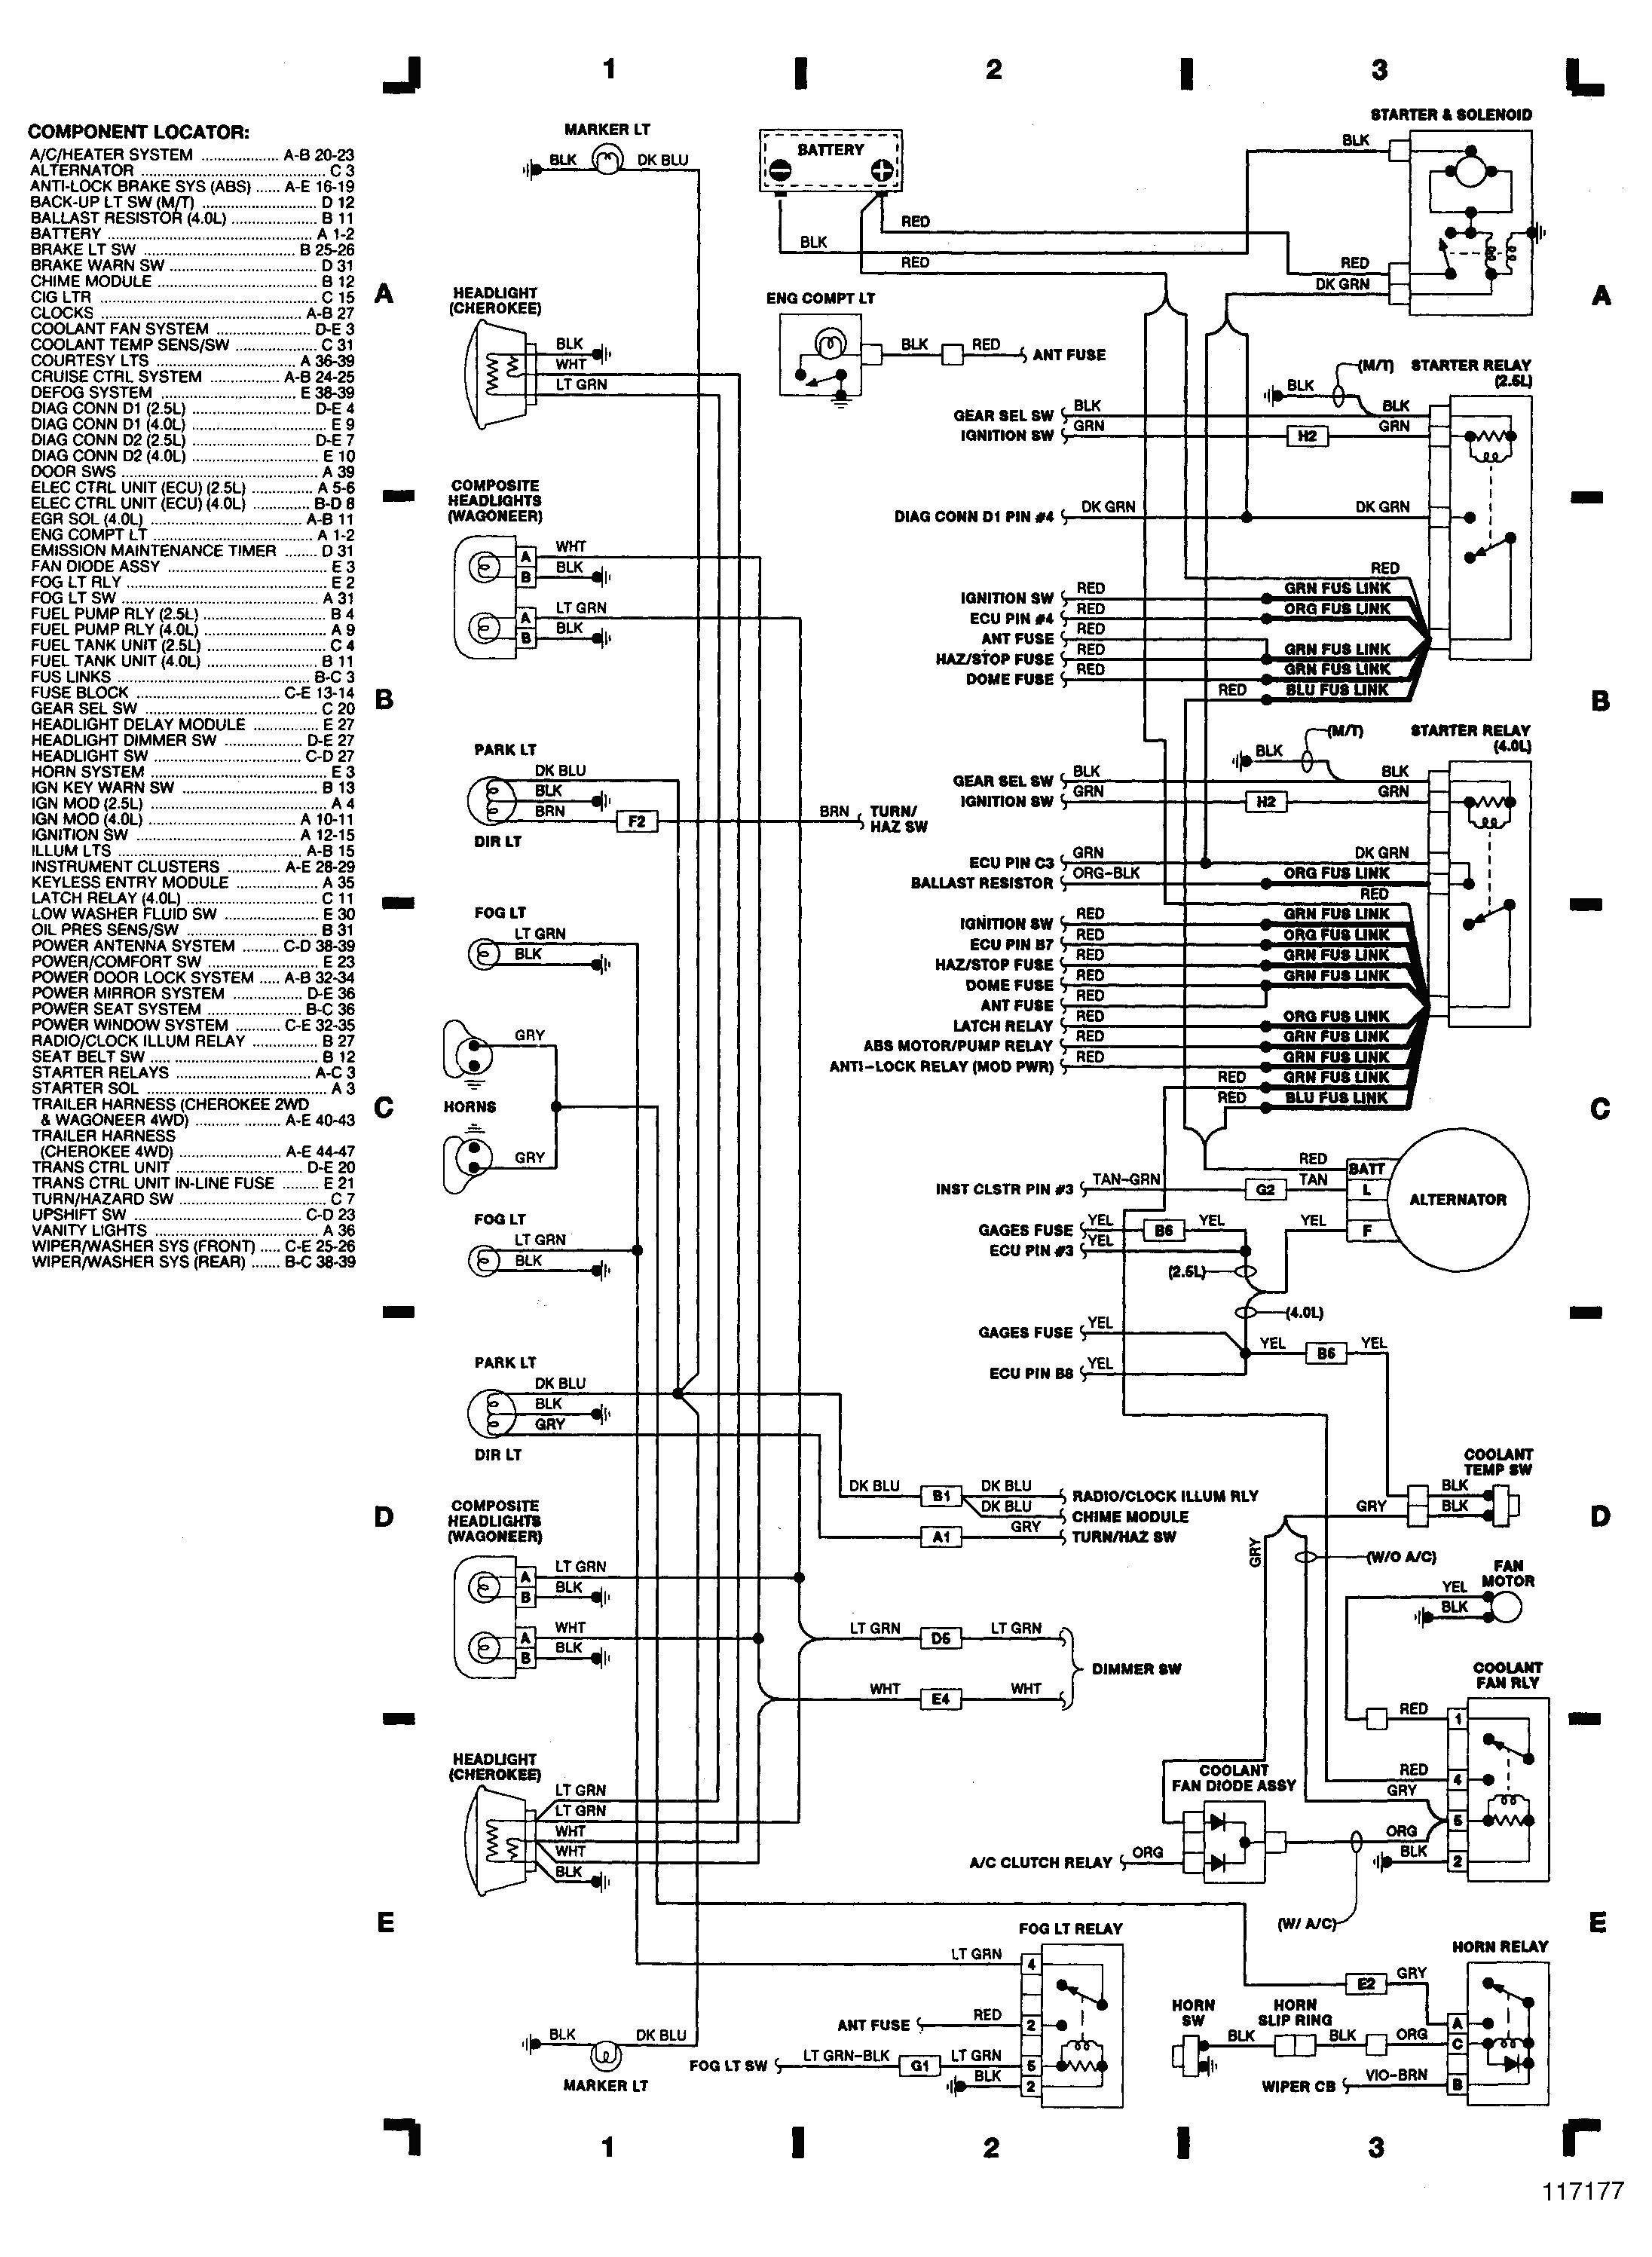 John Deere Gatoe Ts 4x 2 Wire Diagram Diagram] John Deere Gator Fuse Box Diagram Full Version Hd